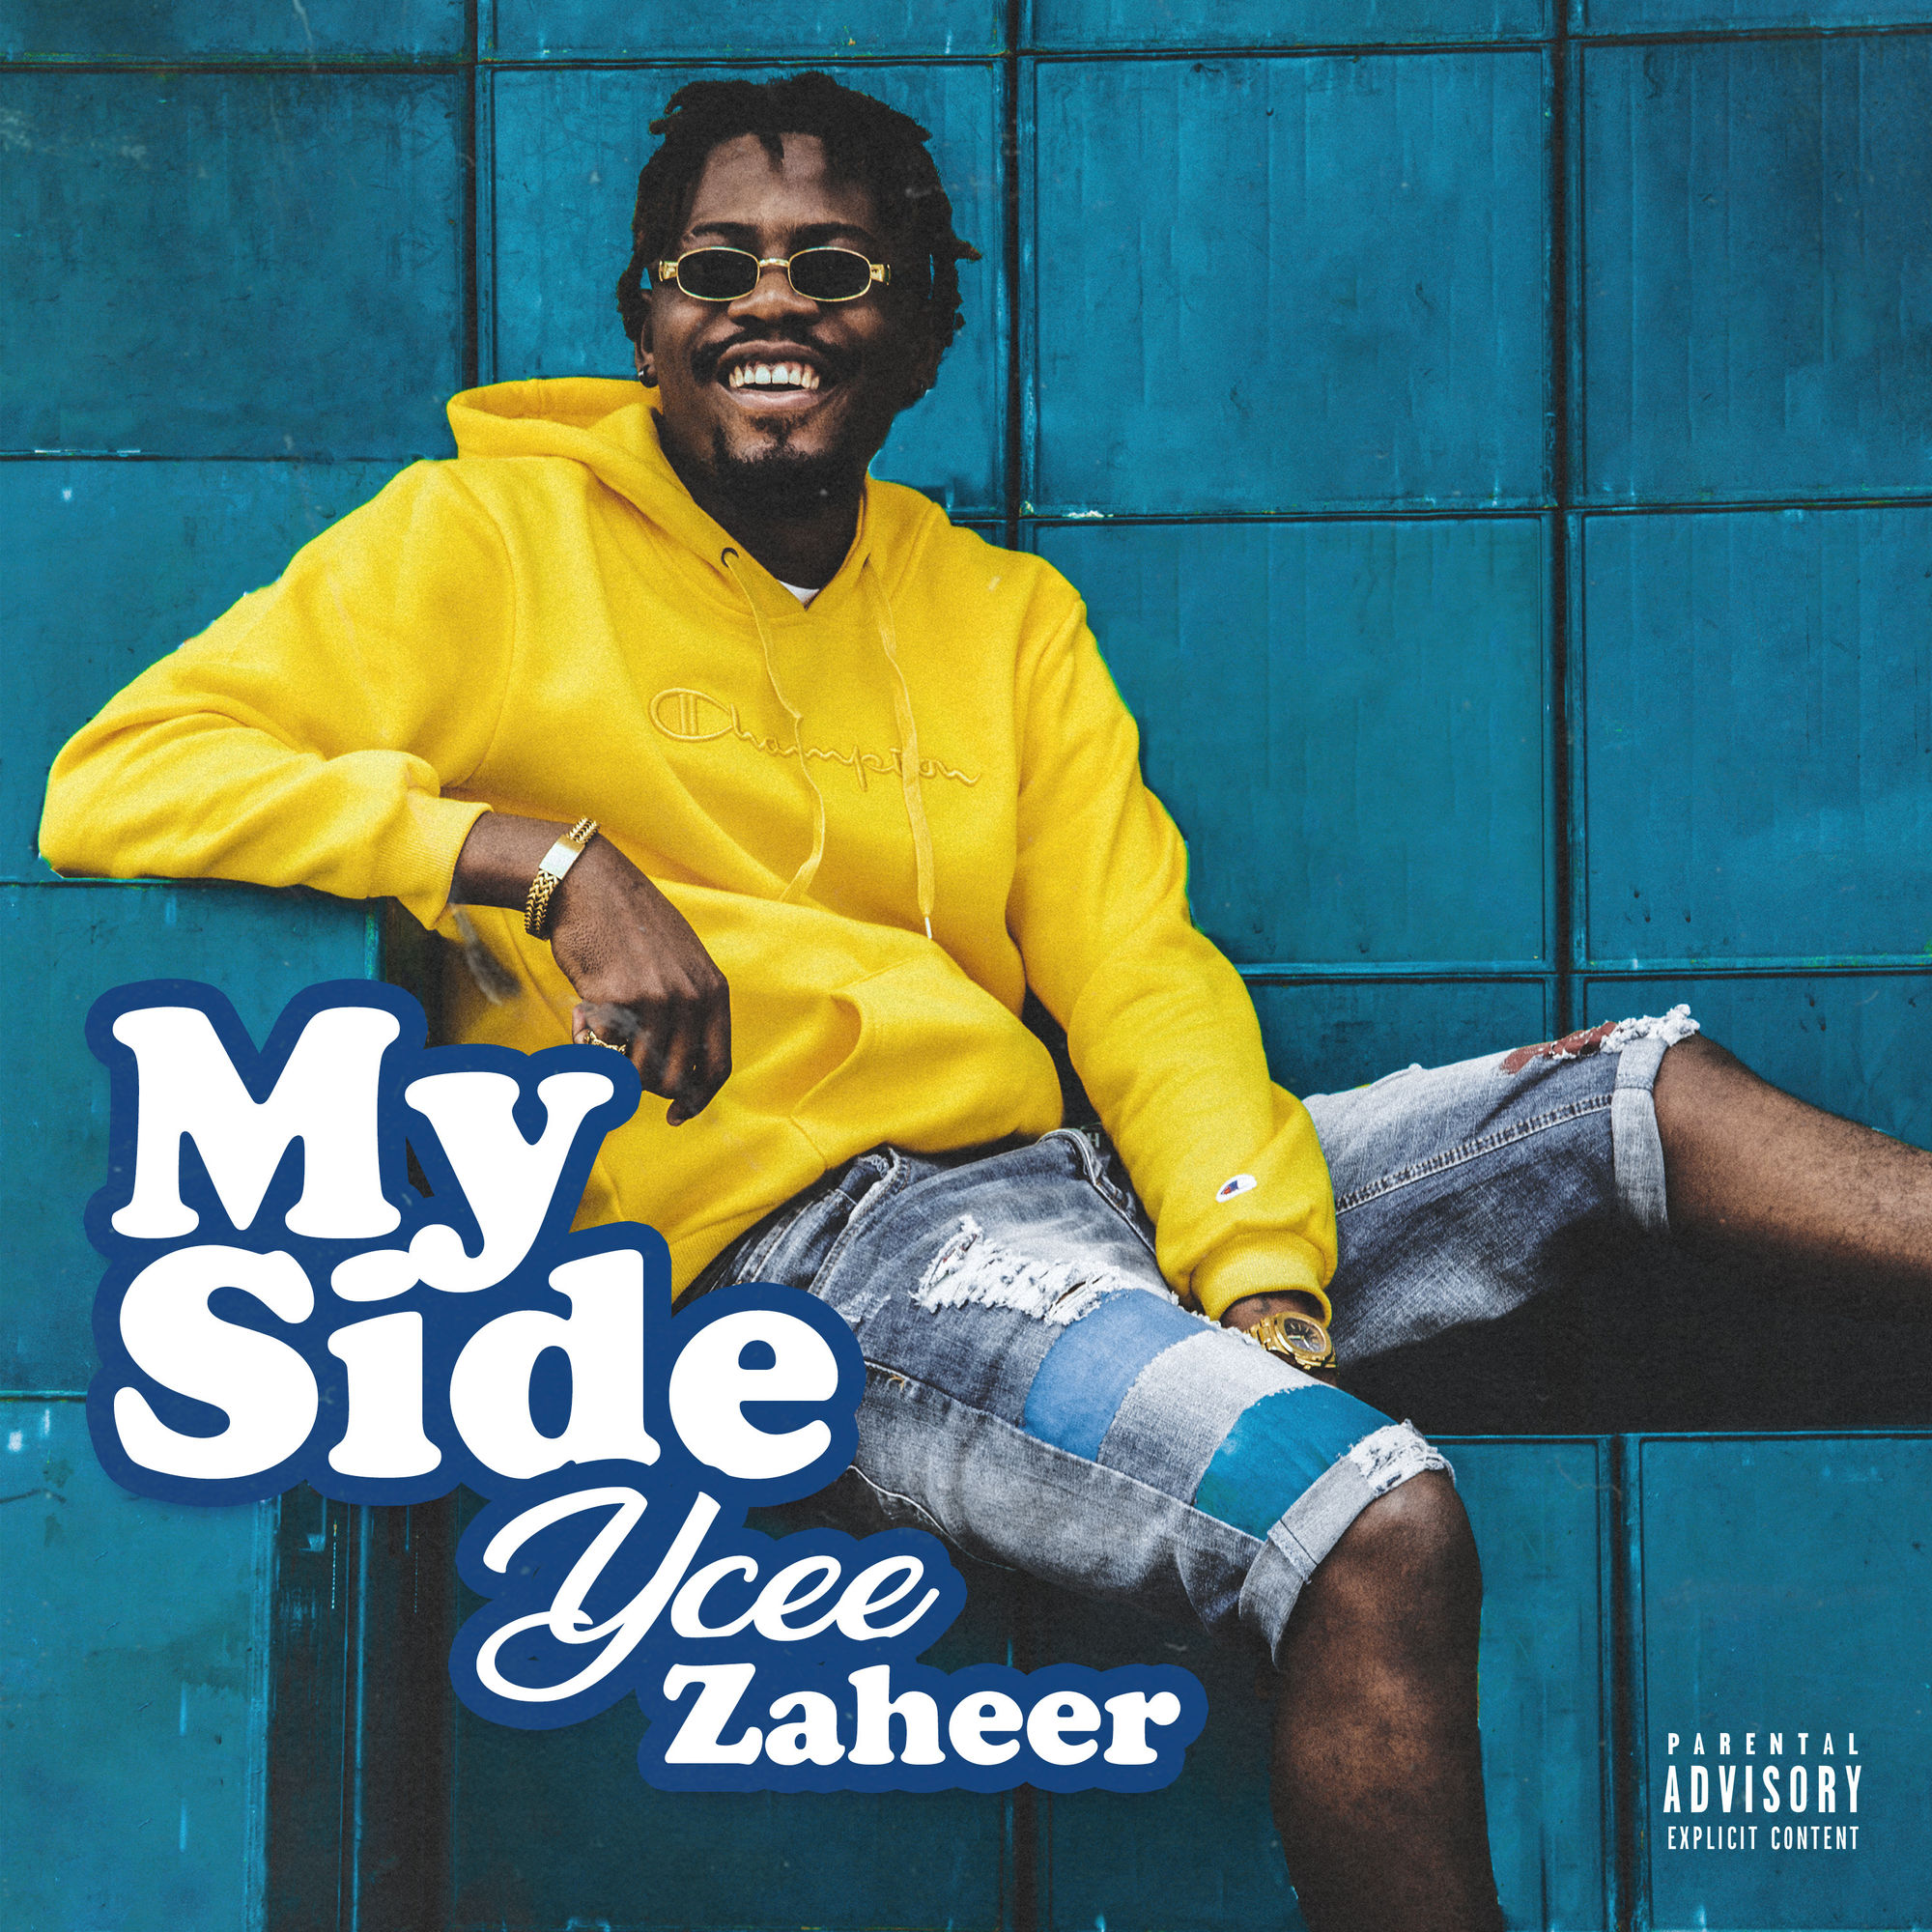 Ycee Zaheer – My Side